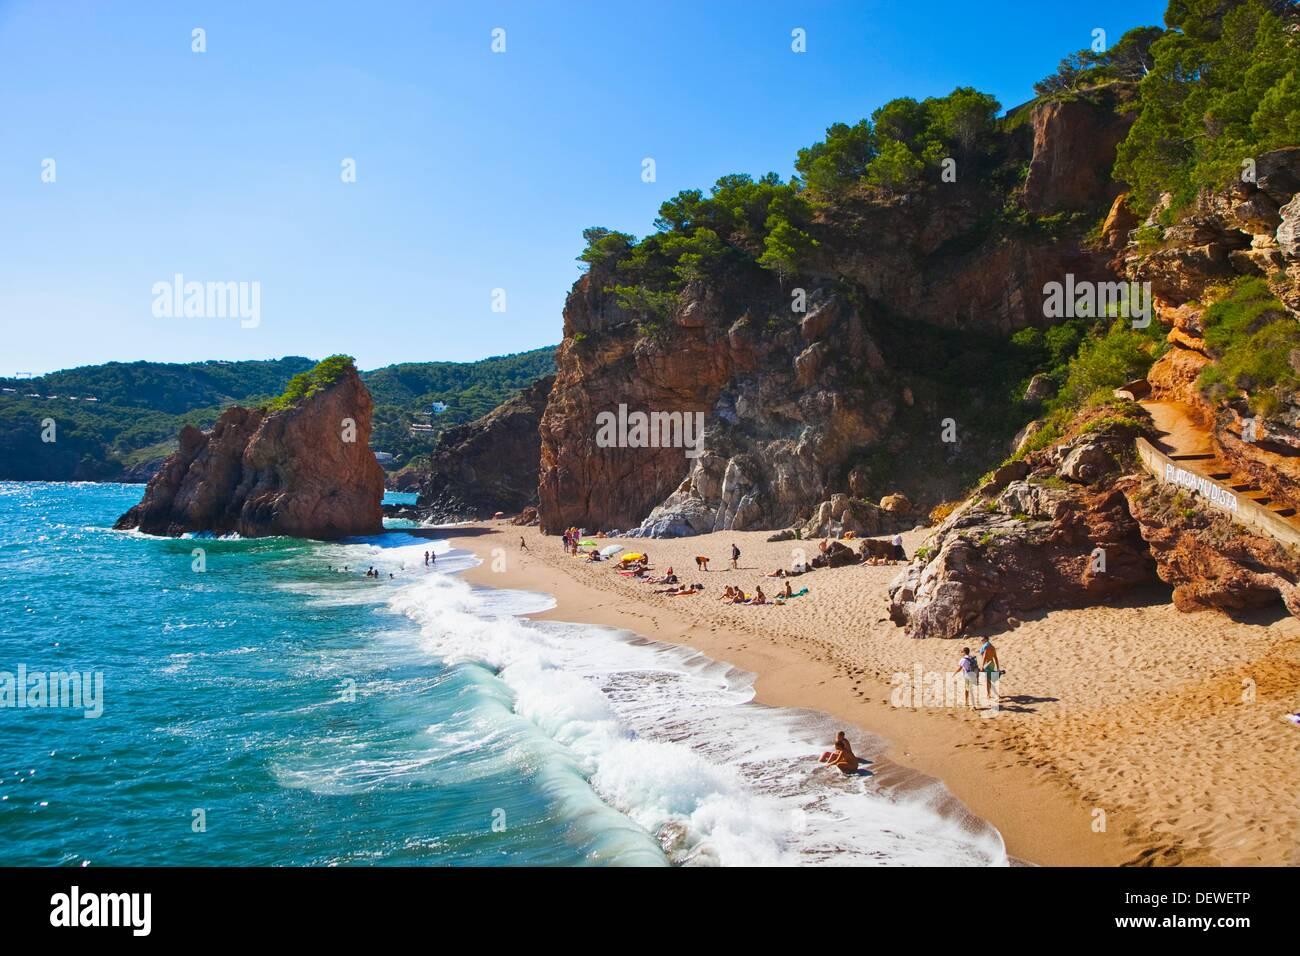 63 >> Illa Roja nudist beach, Begur, Baix Emporda, Costa Brava, Girona Stock Photo, Royalty Free Image ...